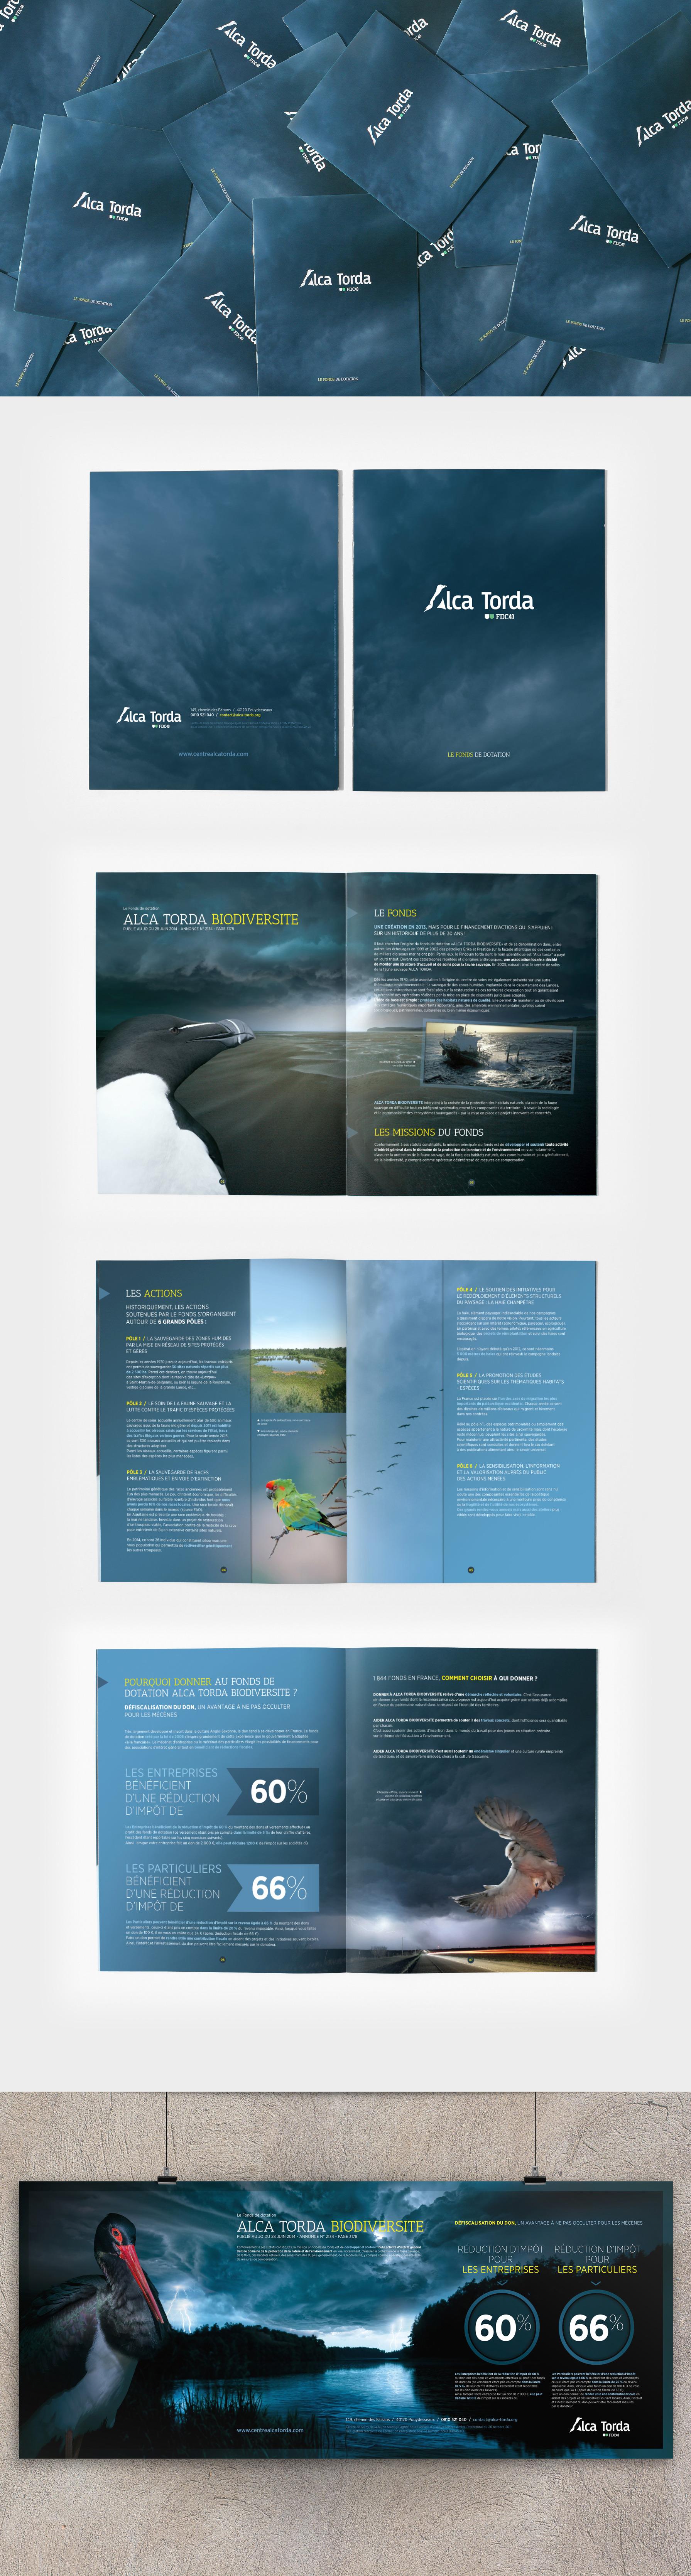 affiche_communication_alcatorda-3